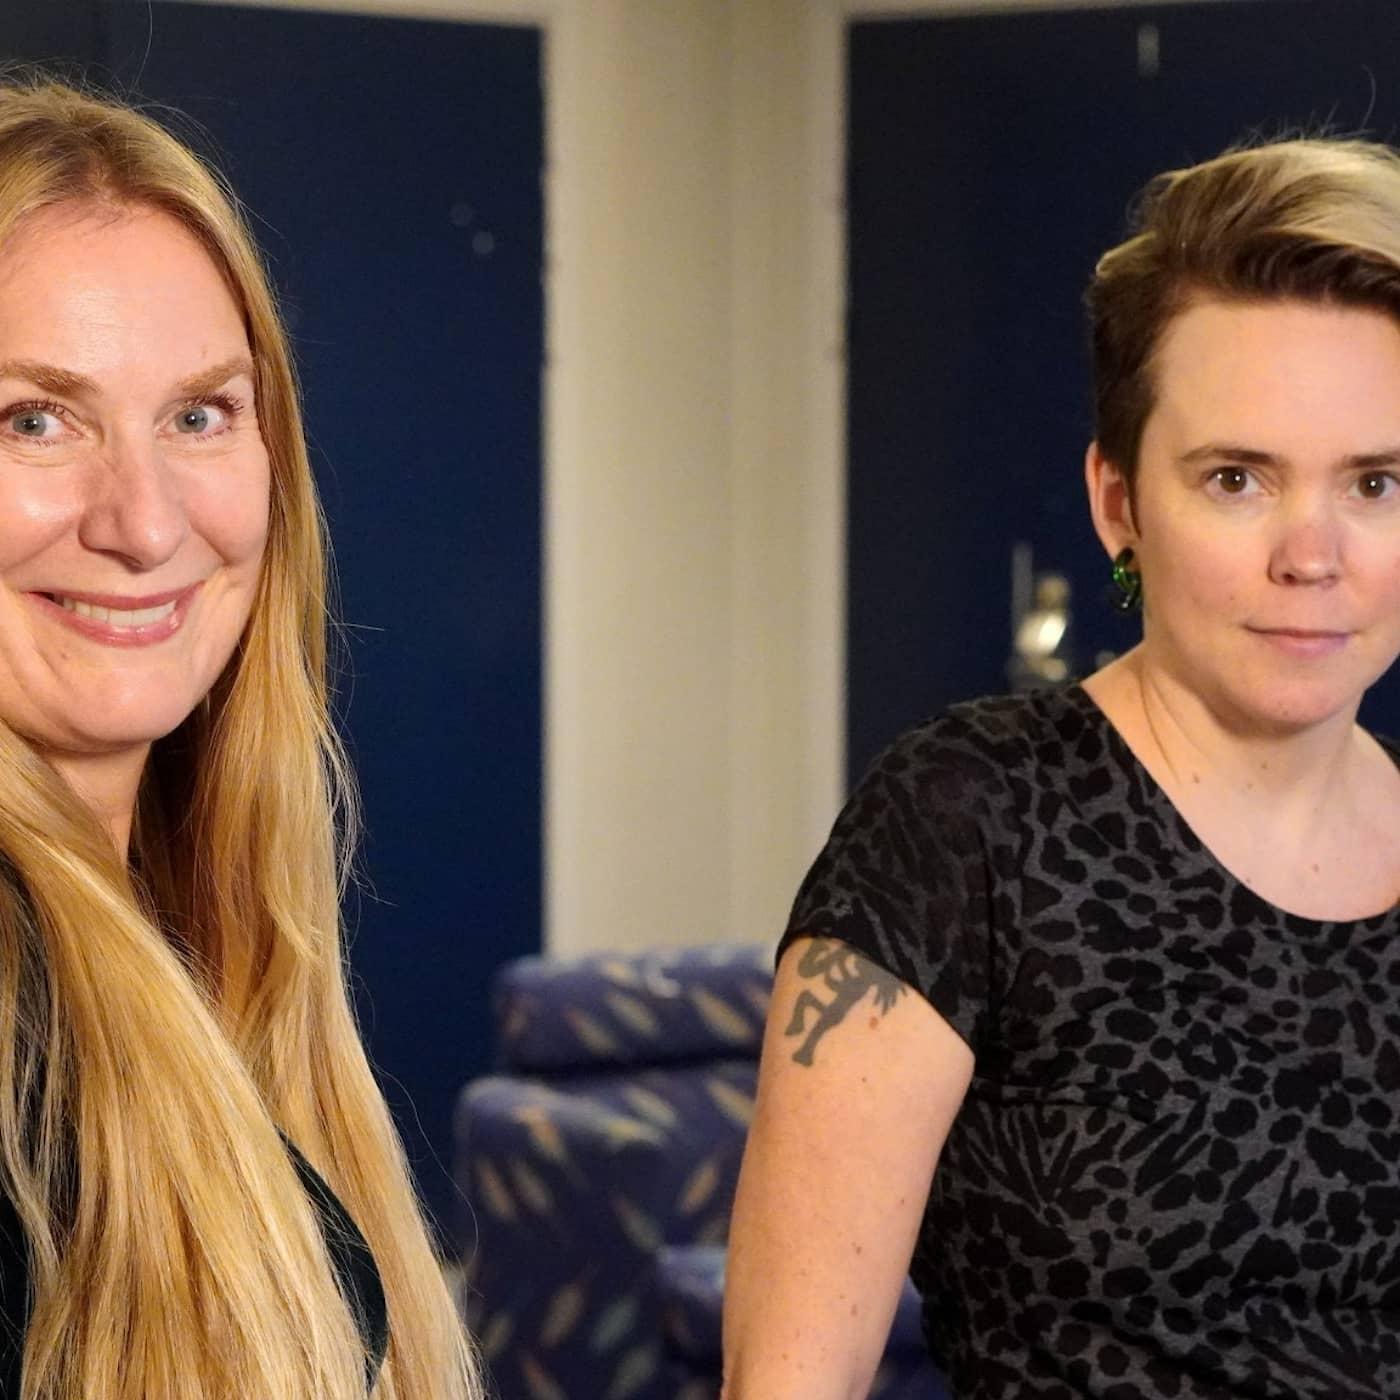 Kalmar, levande begravd reporter & lokala amerikaner - Lantzkampen vecka 45